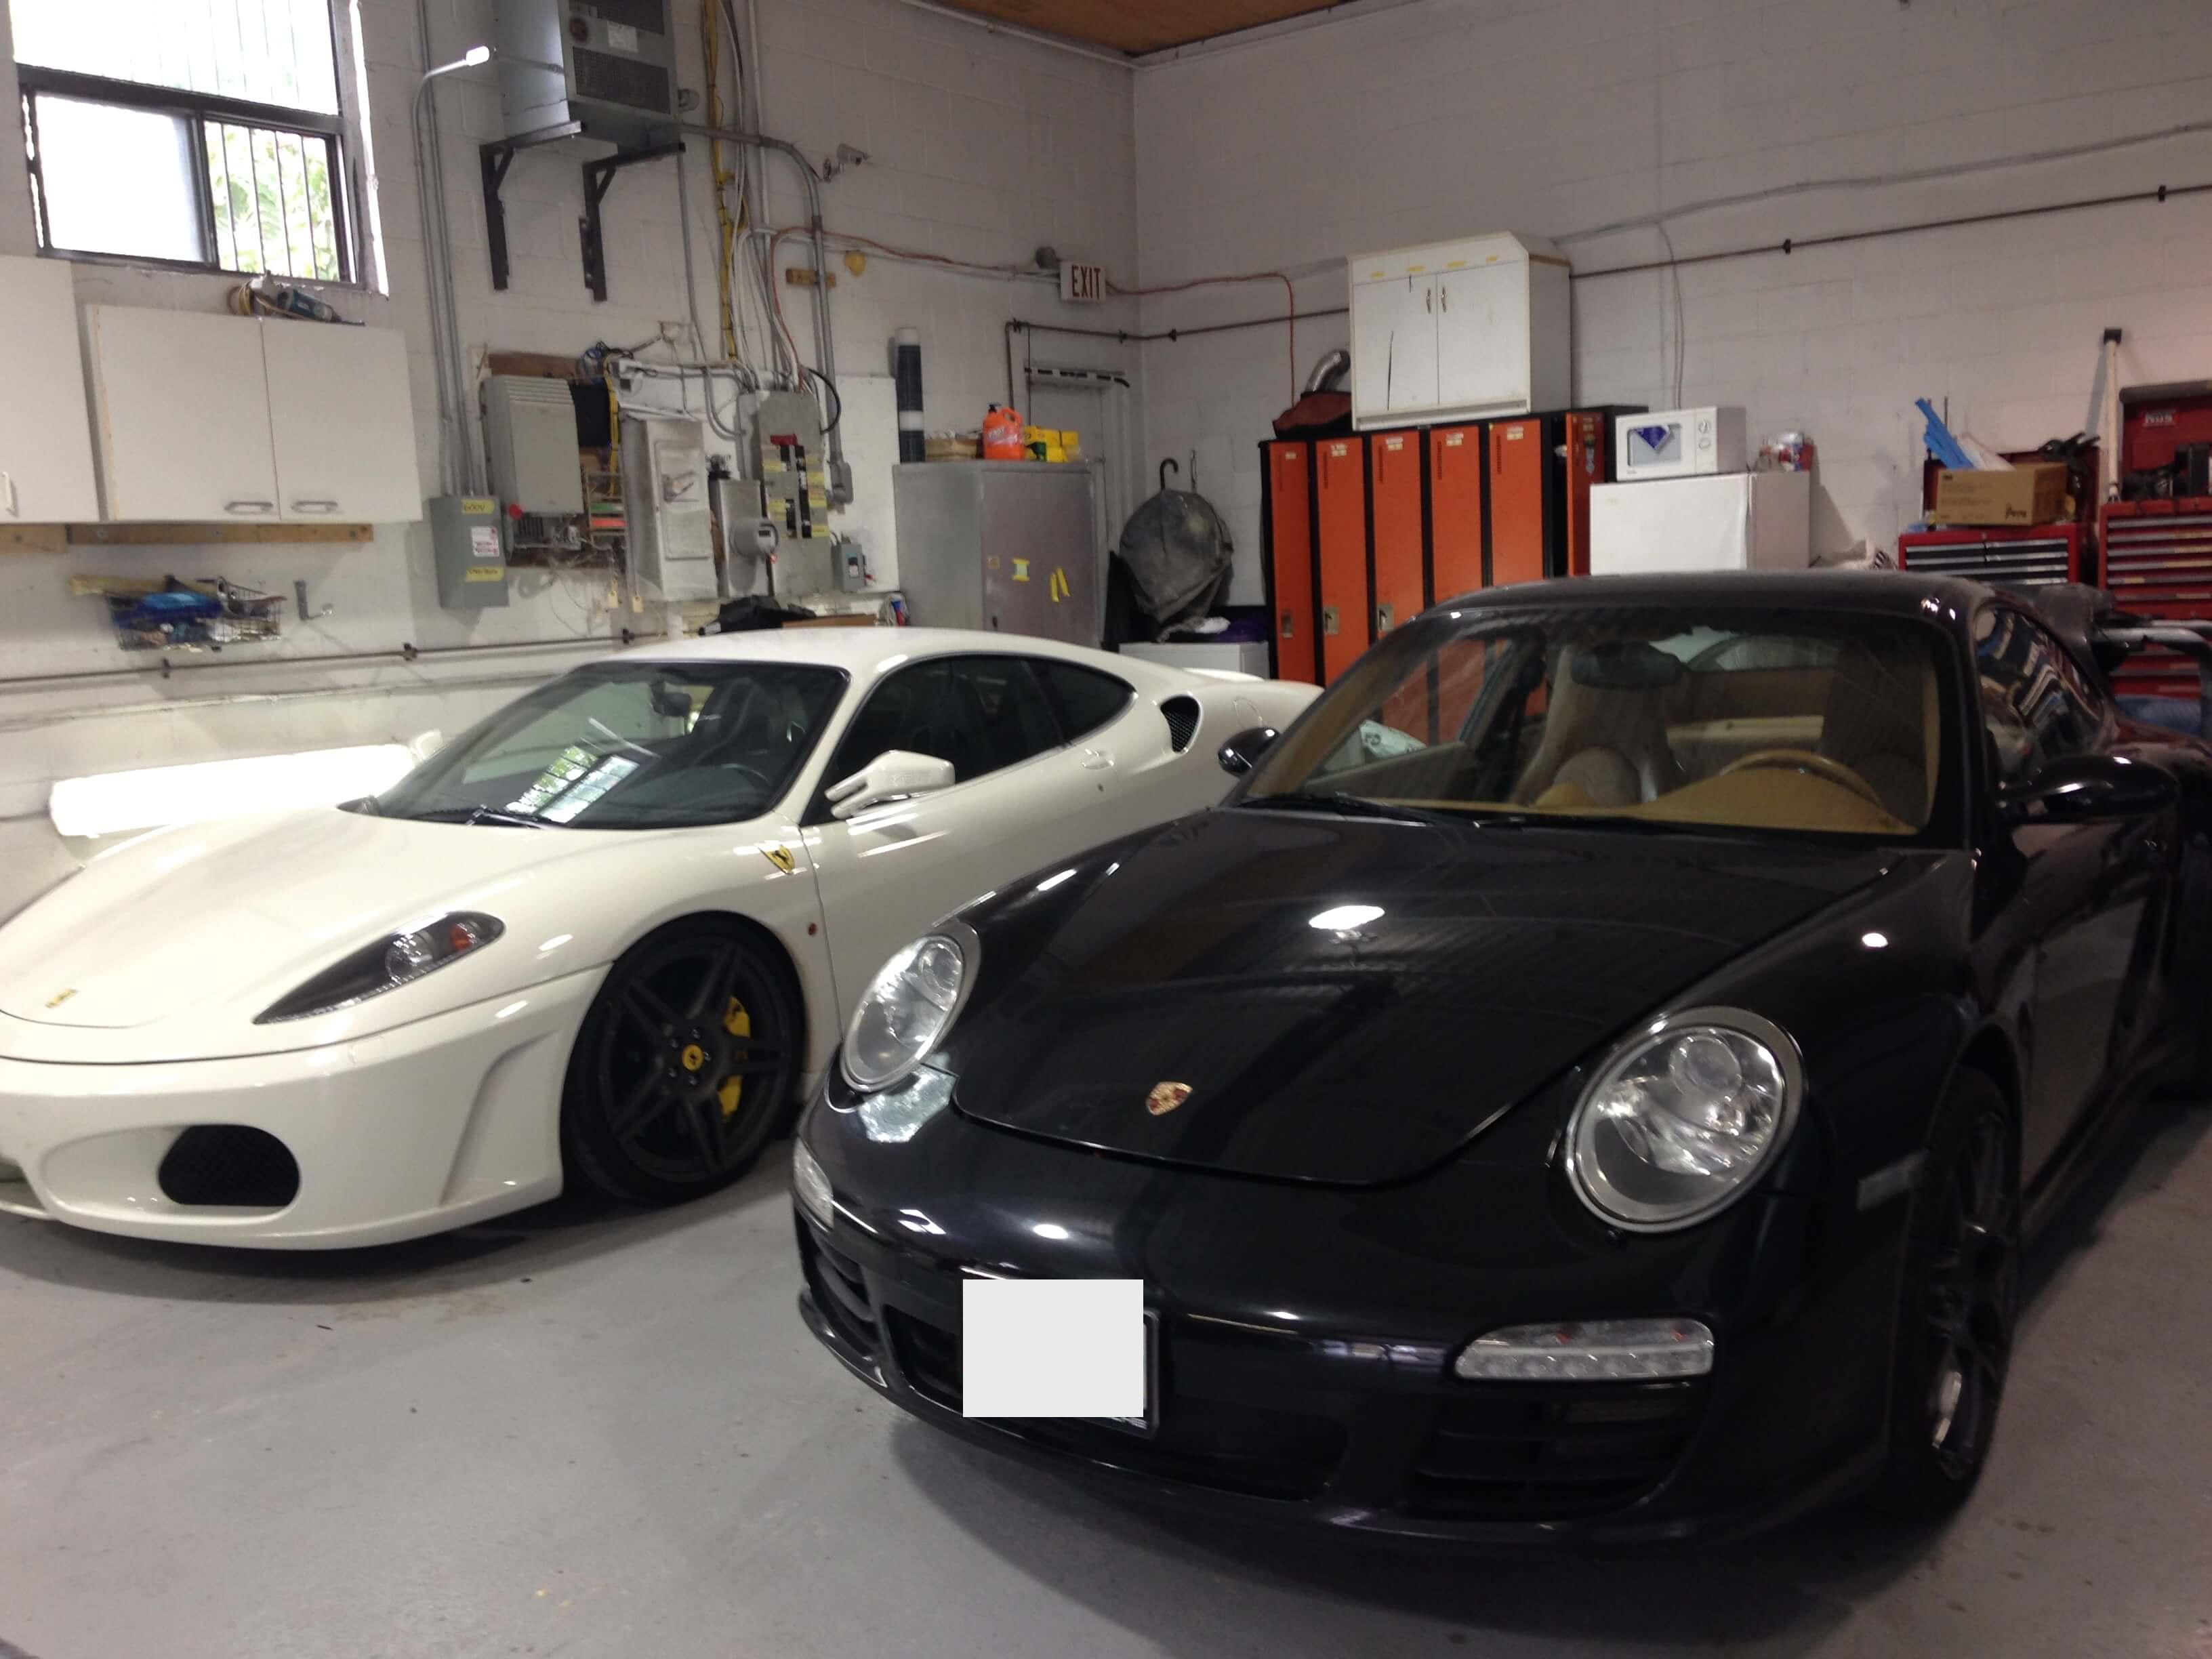 Atlantico-Auto-Collision-Lamborgini-sport-cars